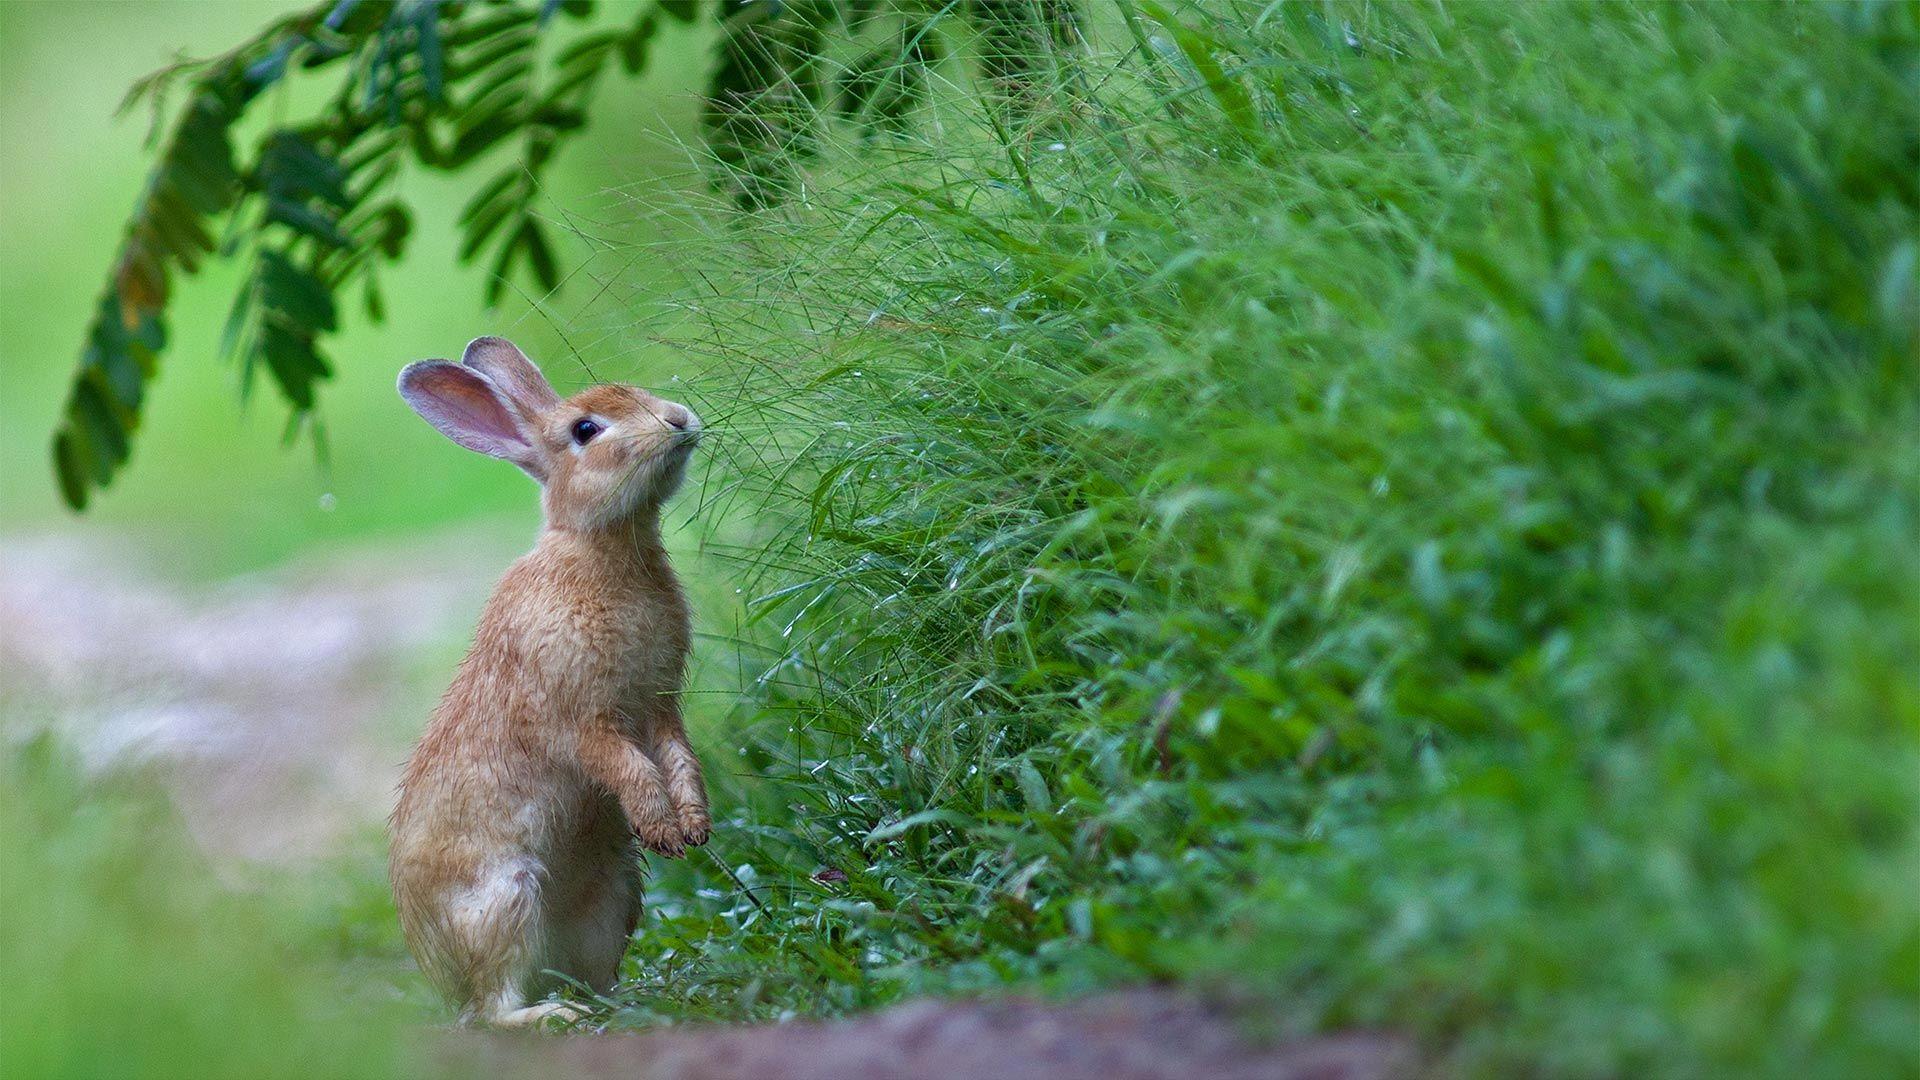 Pin by Adriano Ferreira on Bing Daily Photo Rabbit